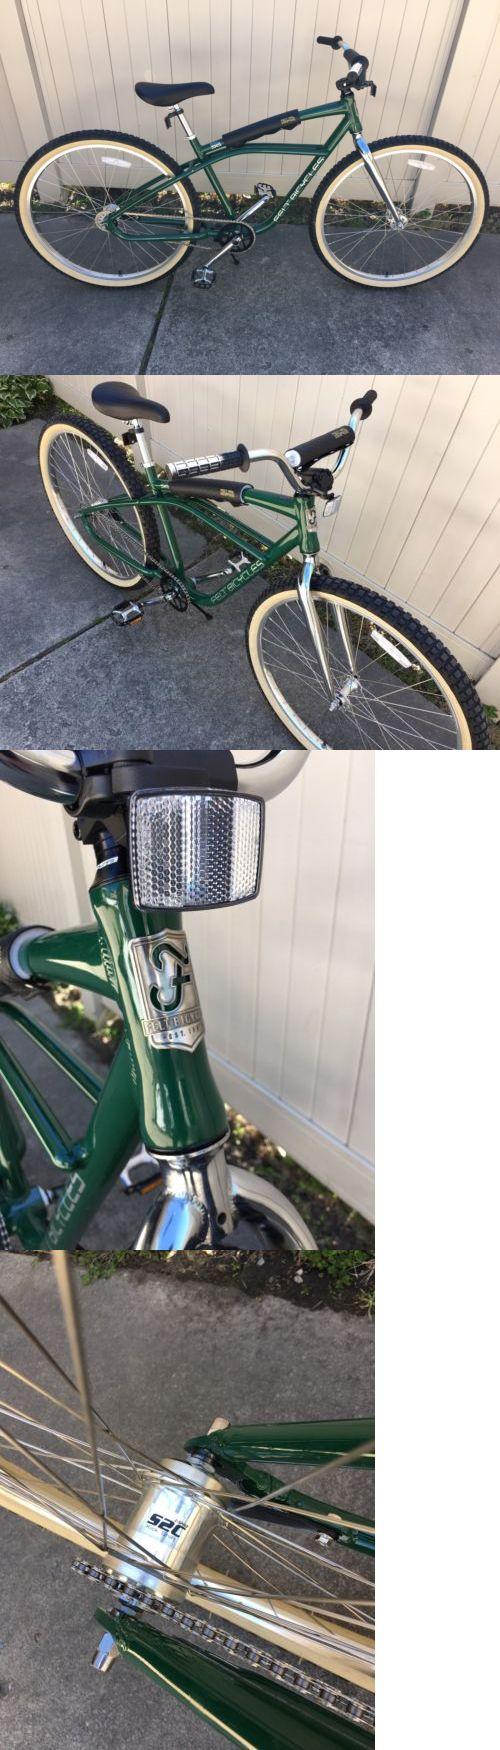 bicycles: New Felt Rail 29 Cruiser Bmx 2 Speed Kickback Klunker -> BUY IT NOW ONLY: $259.99 on eBay!